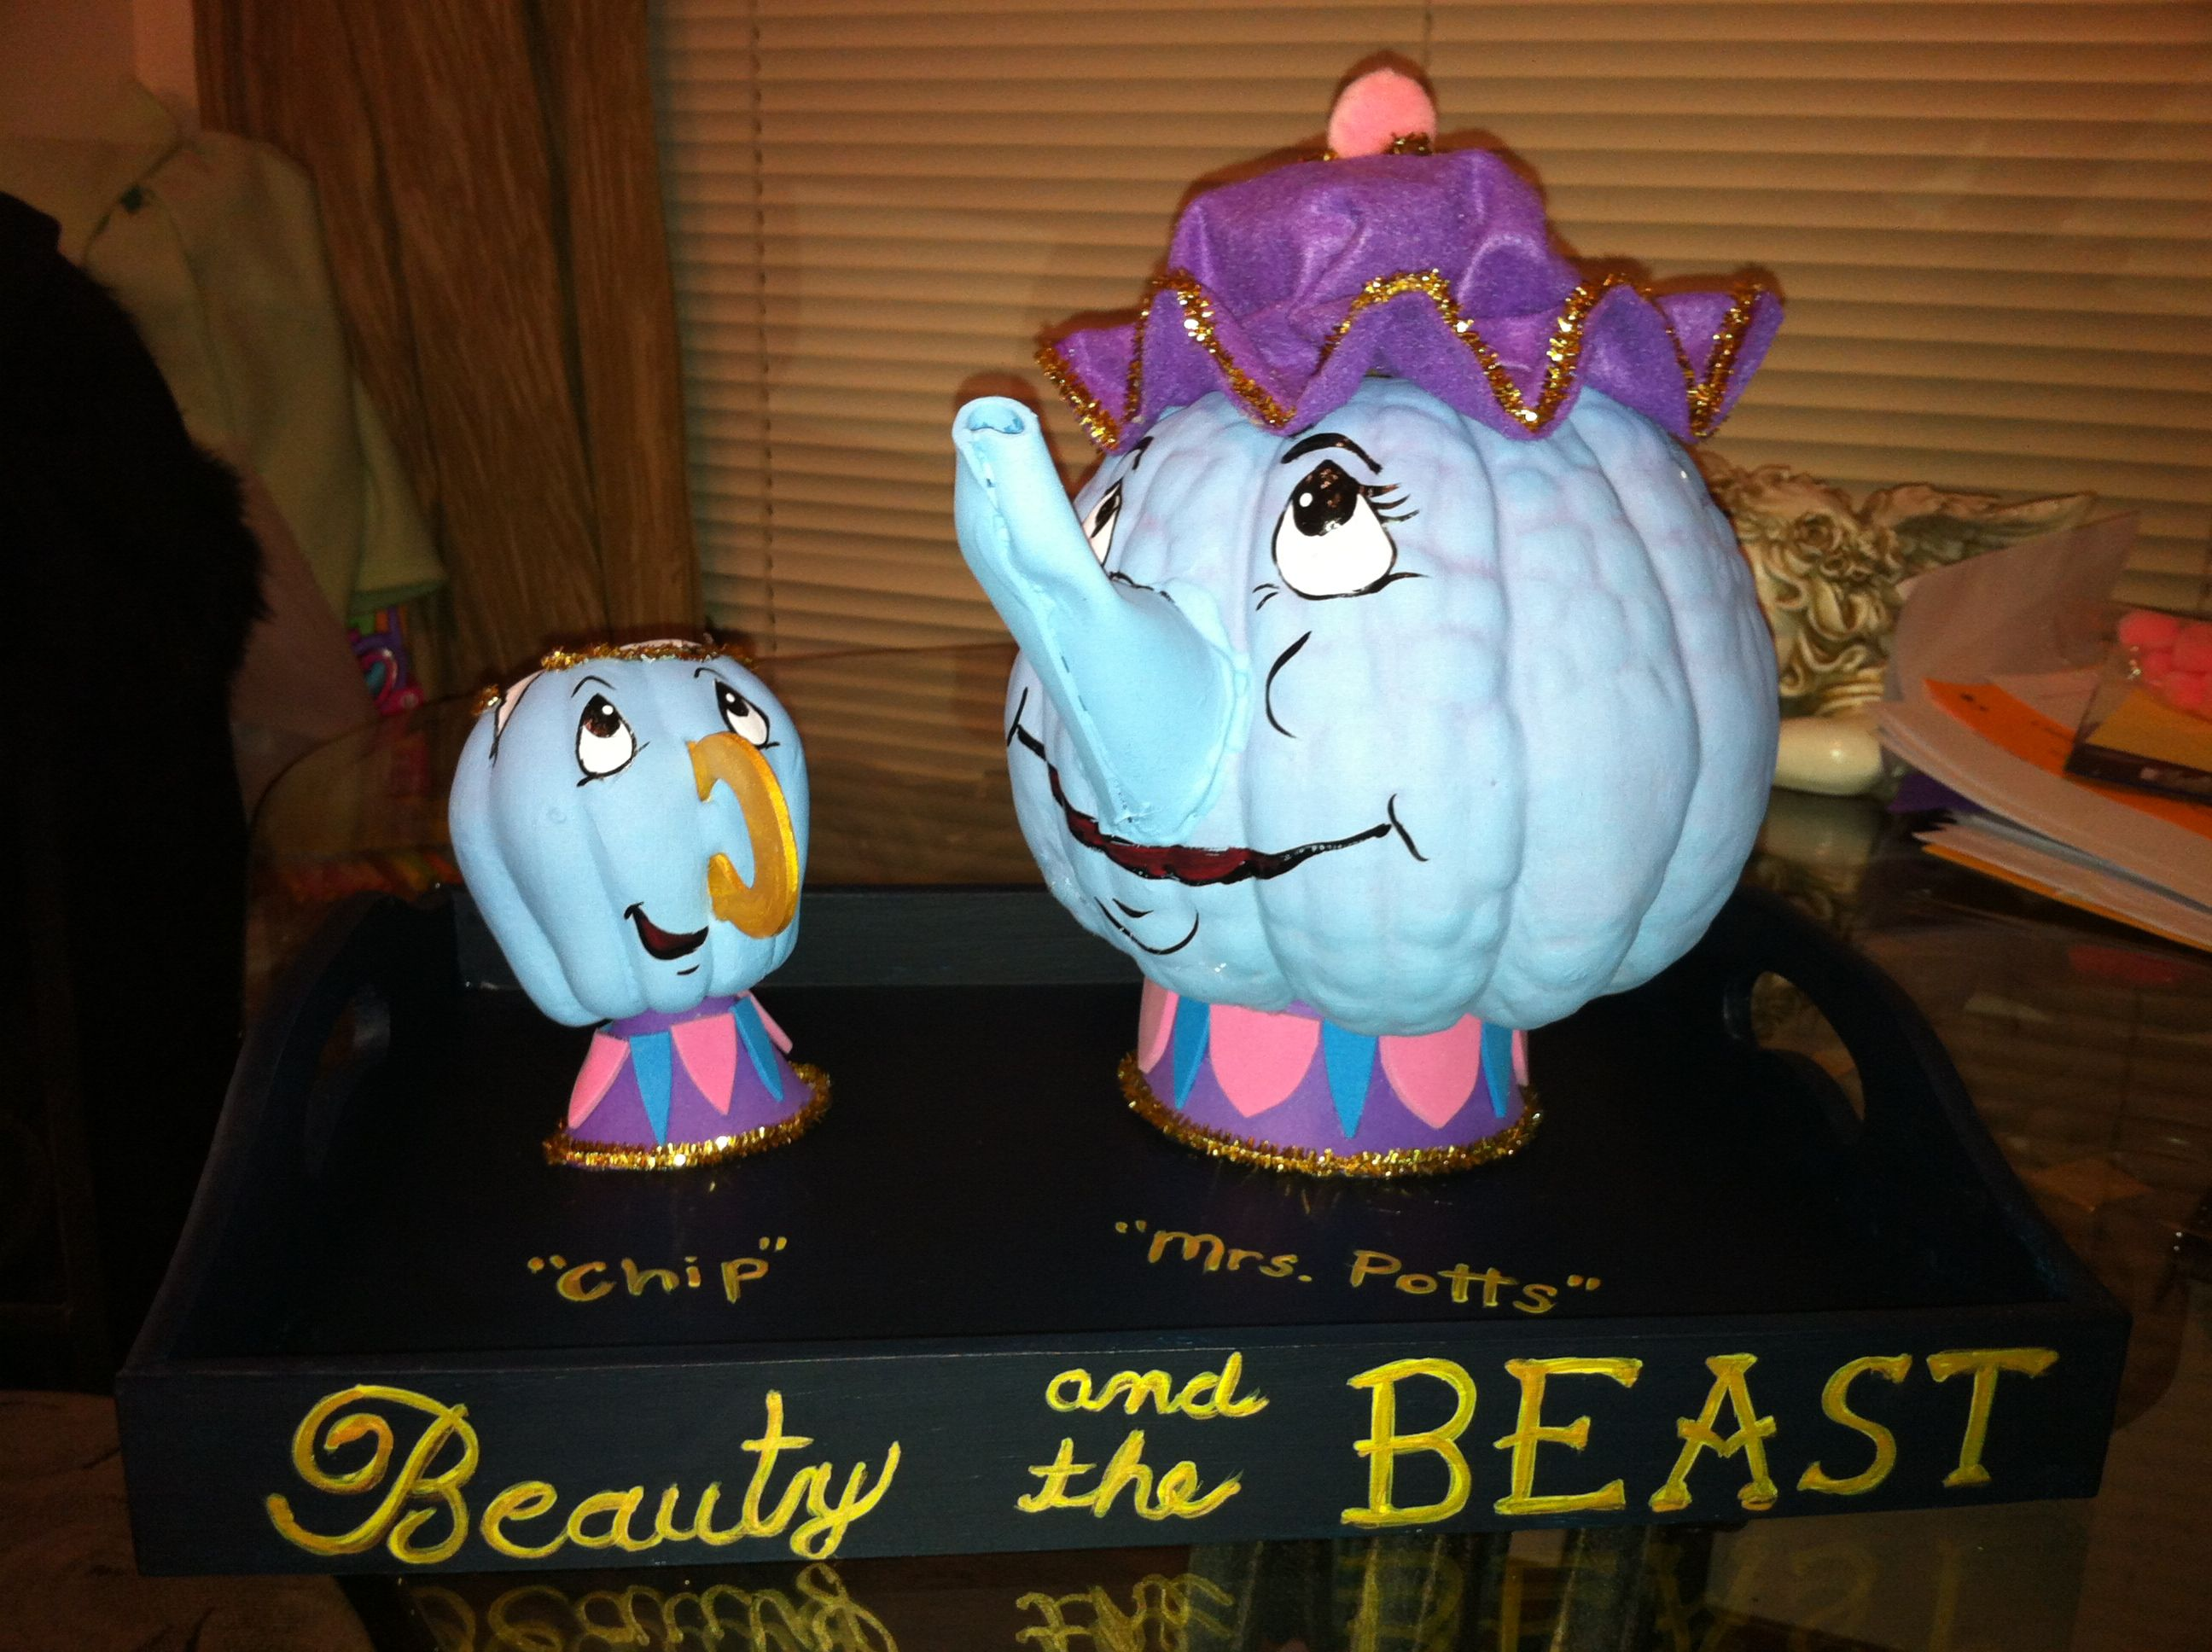 150 Pumpkin Decorating Ideas | Pumpkin decorating contest, Pumpkin ...